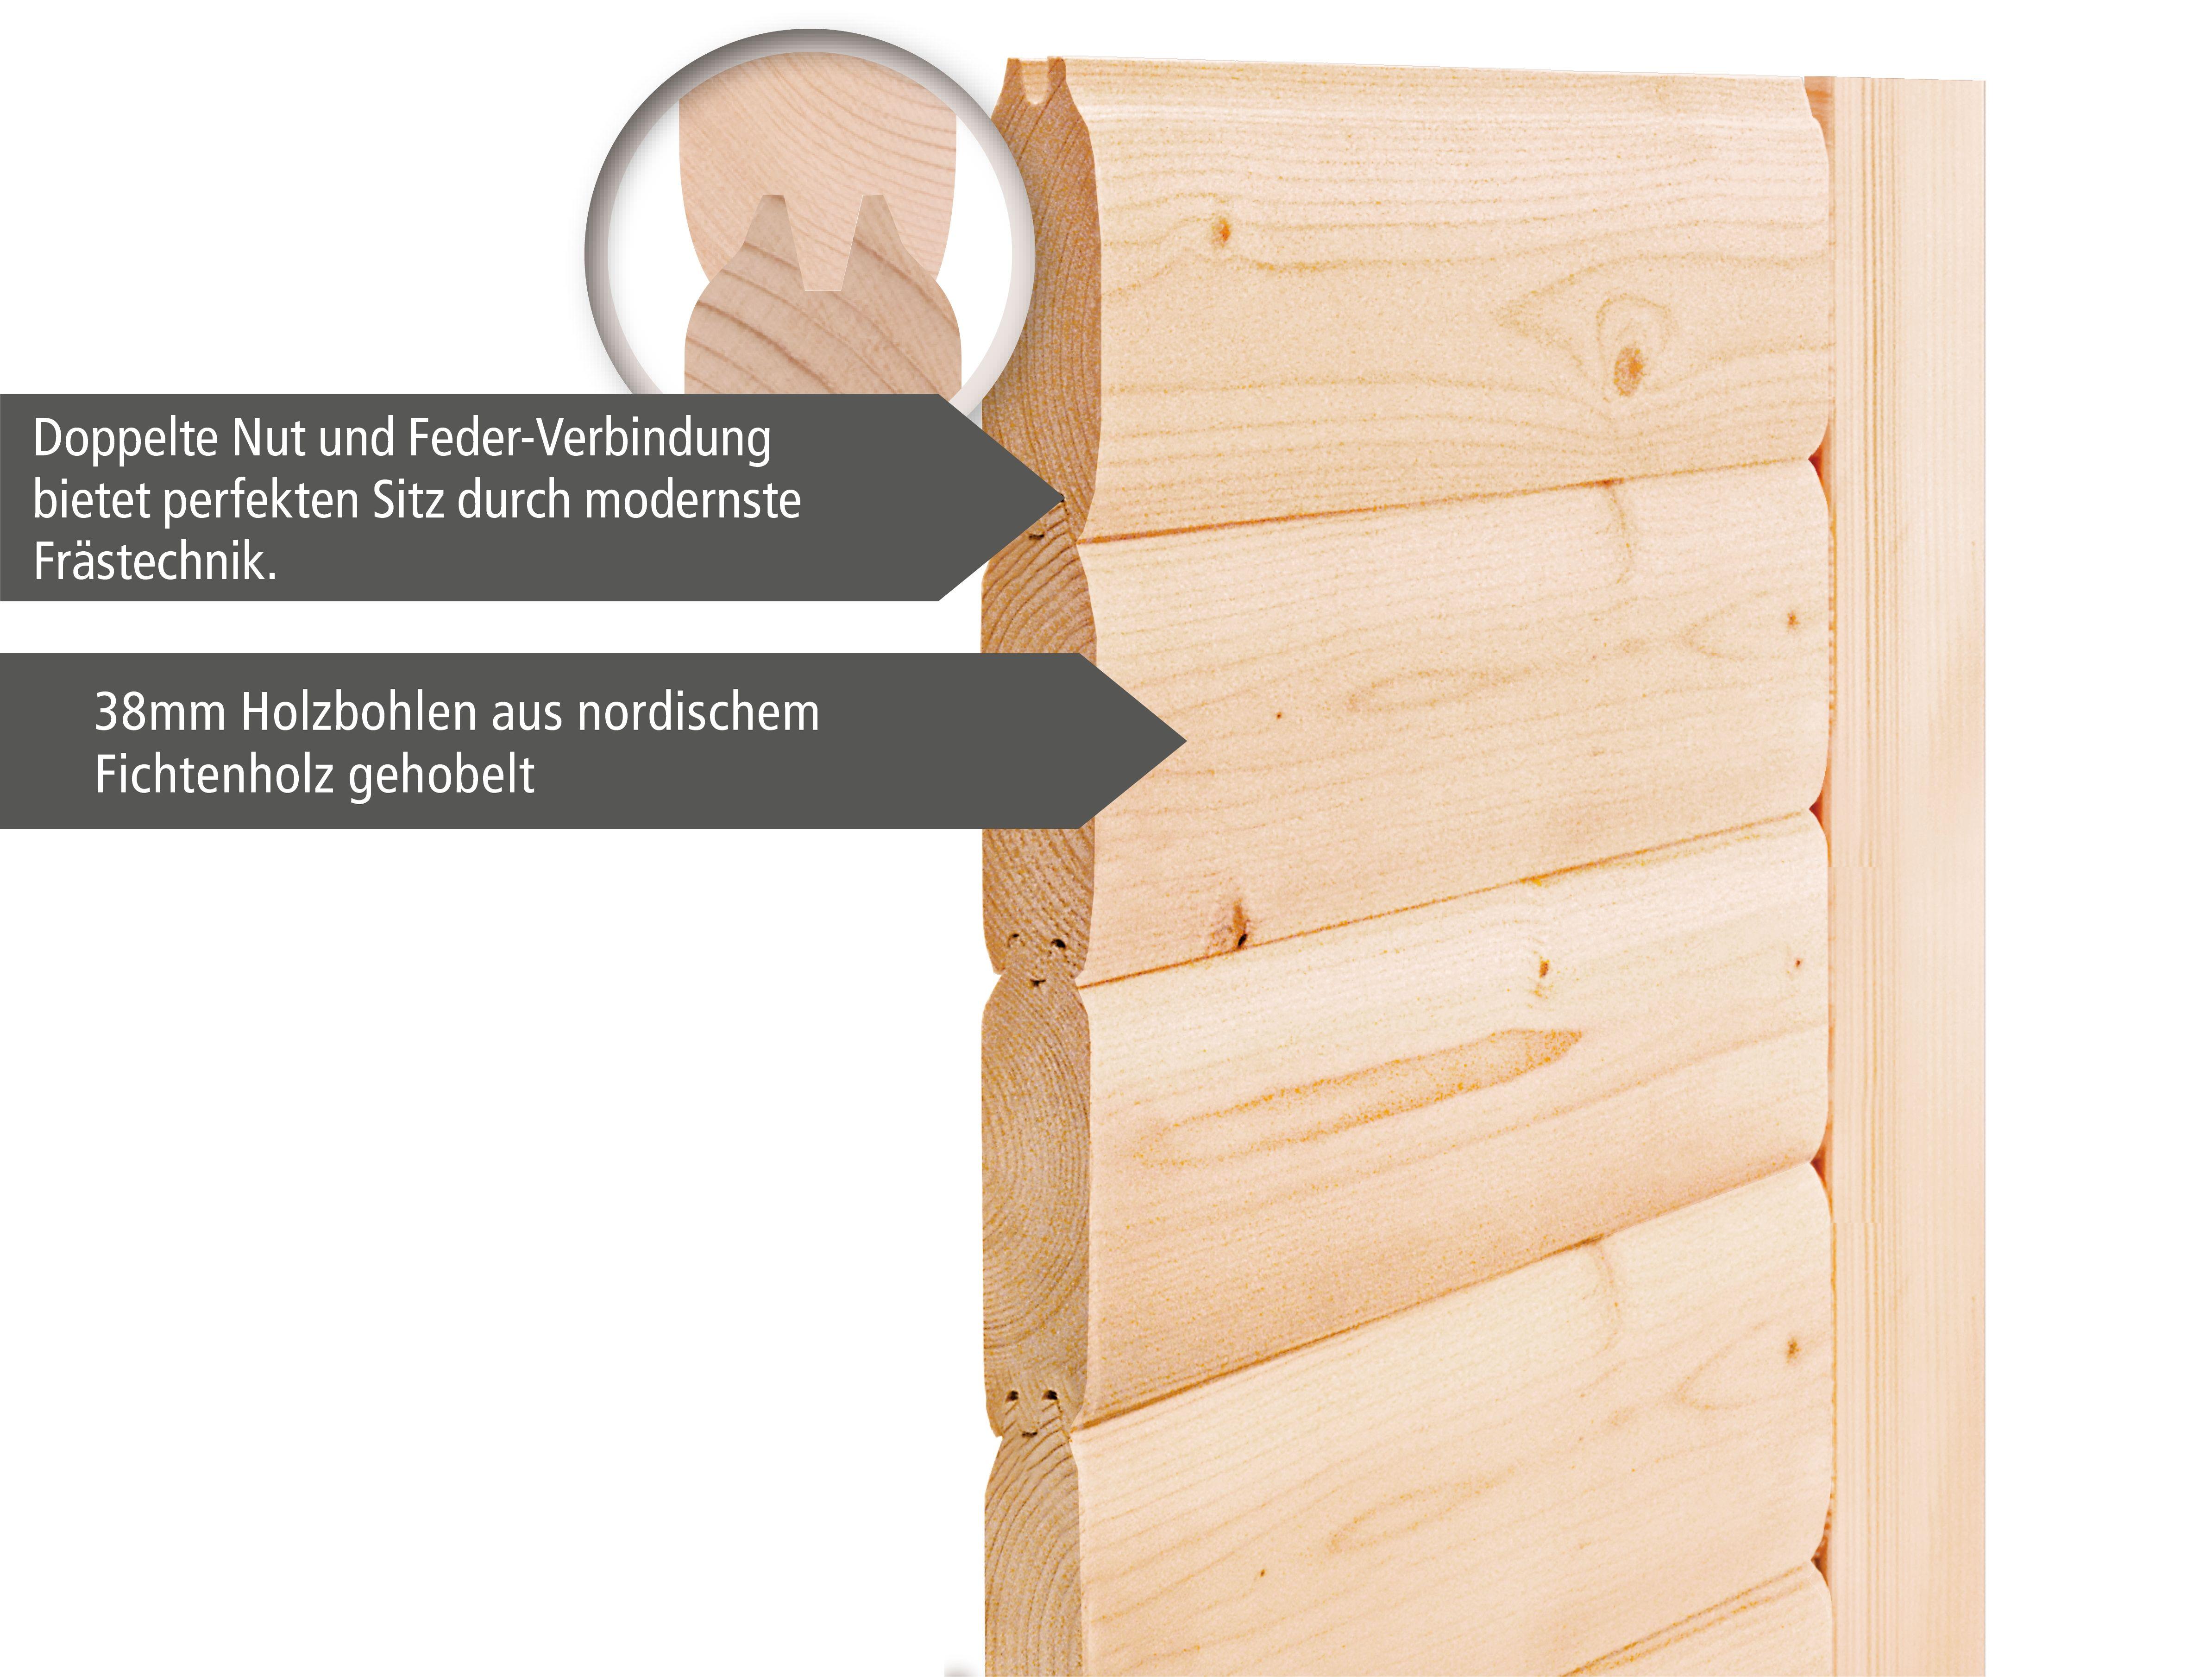 Woodfeeling Sauna Sandra 38mm 230V Bio Saunaofen 3,6kW extern Bild 11